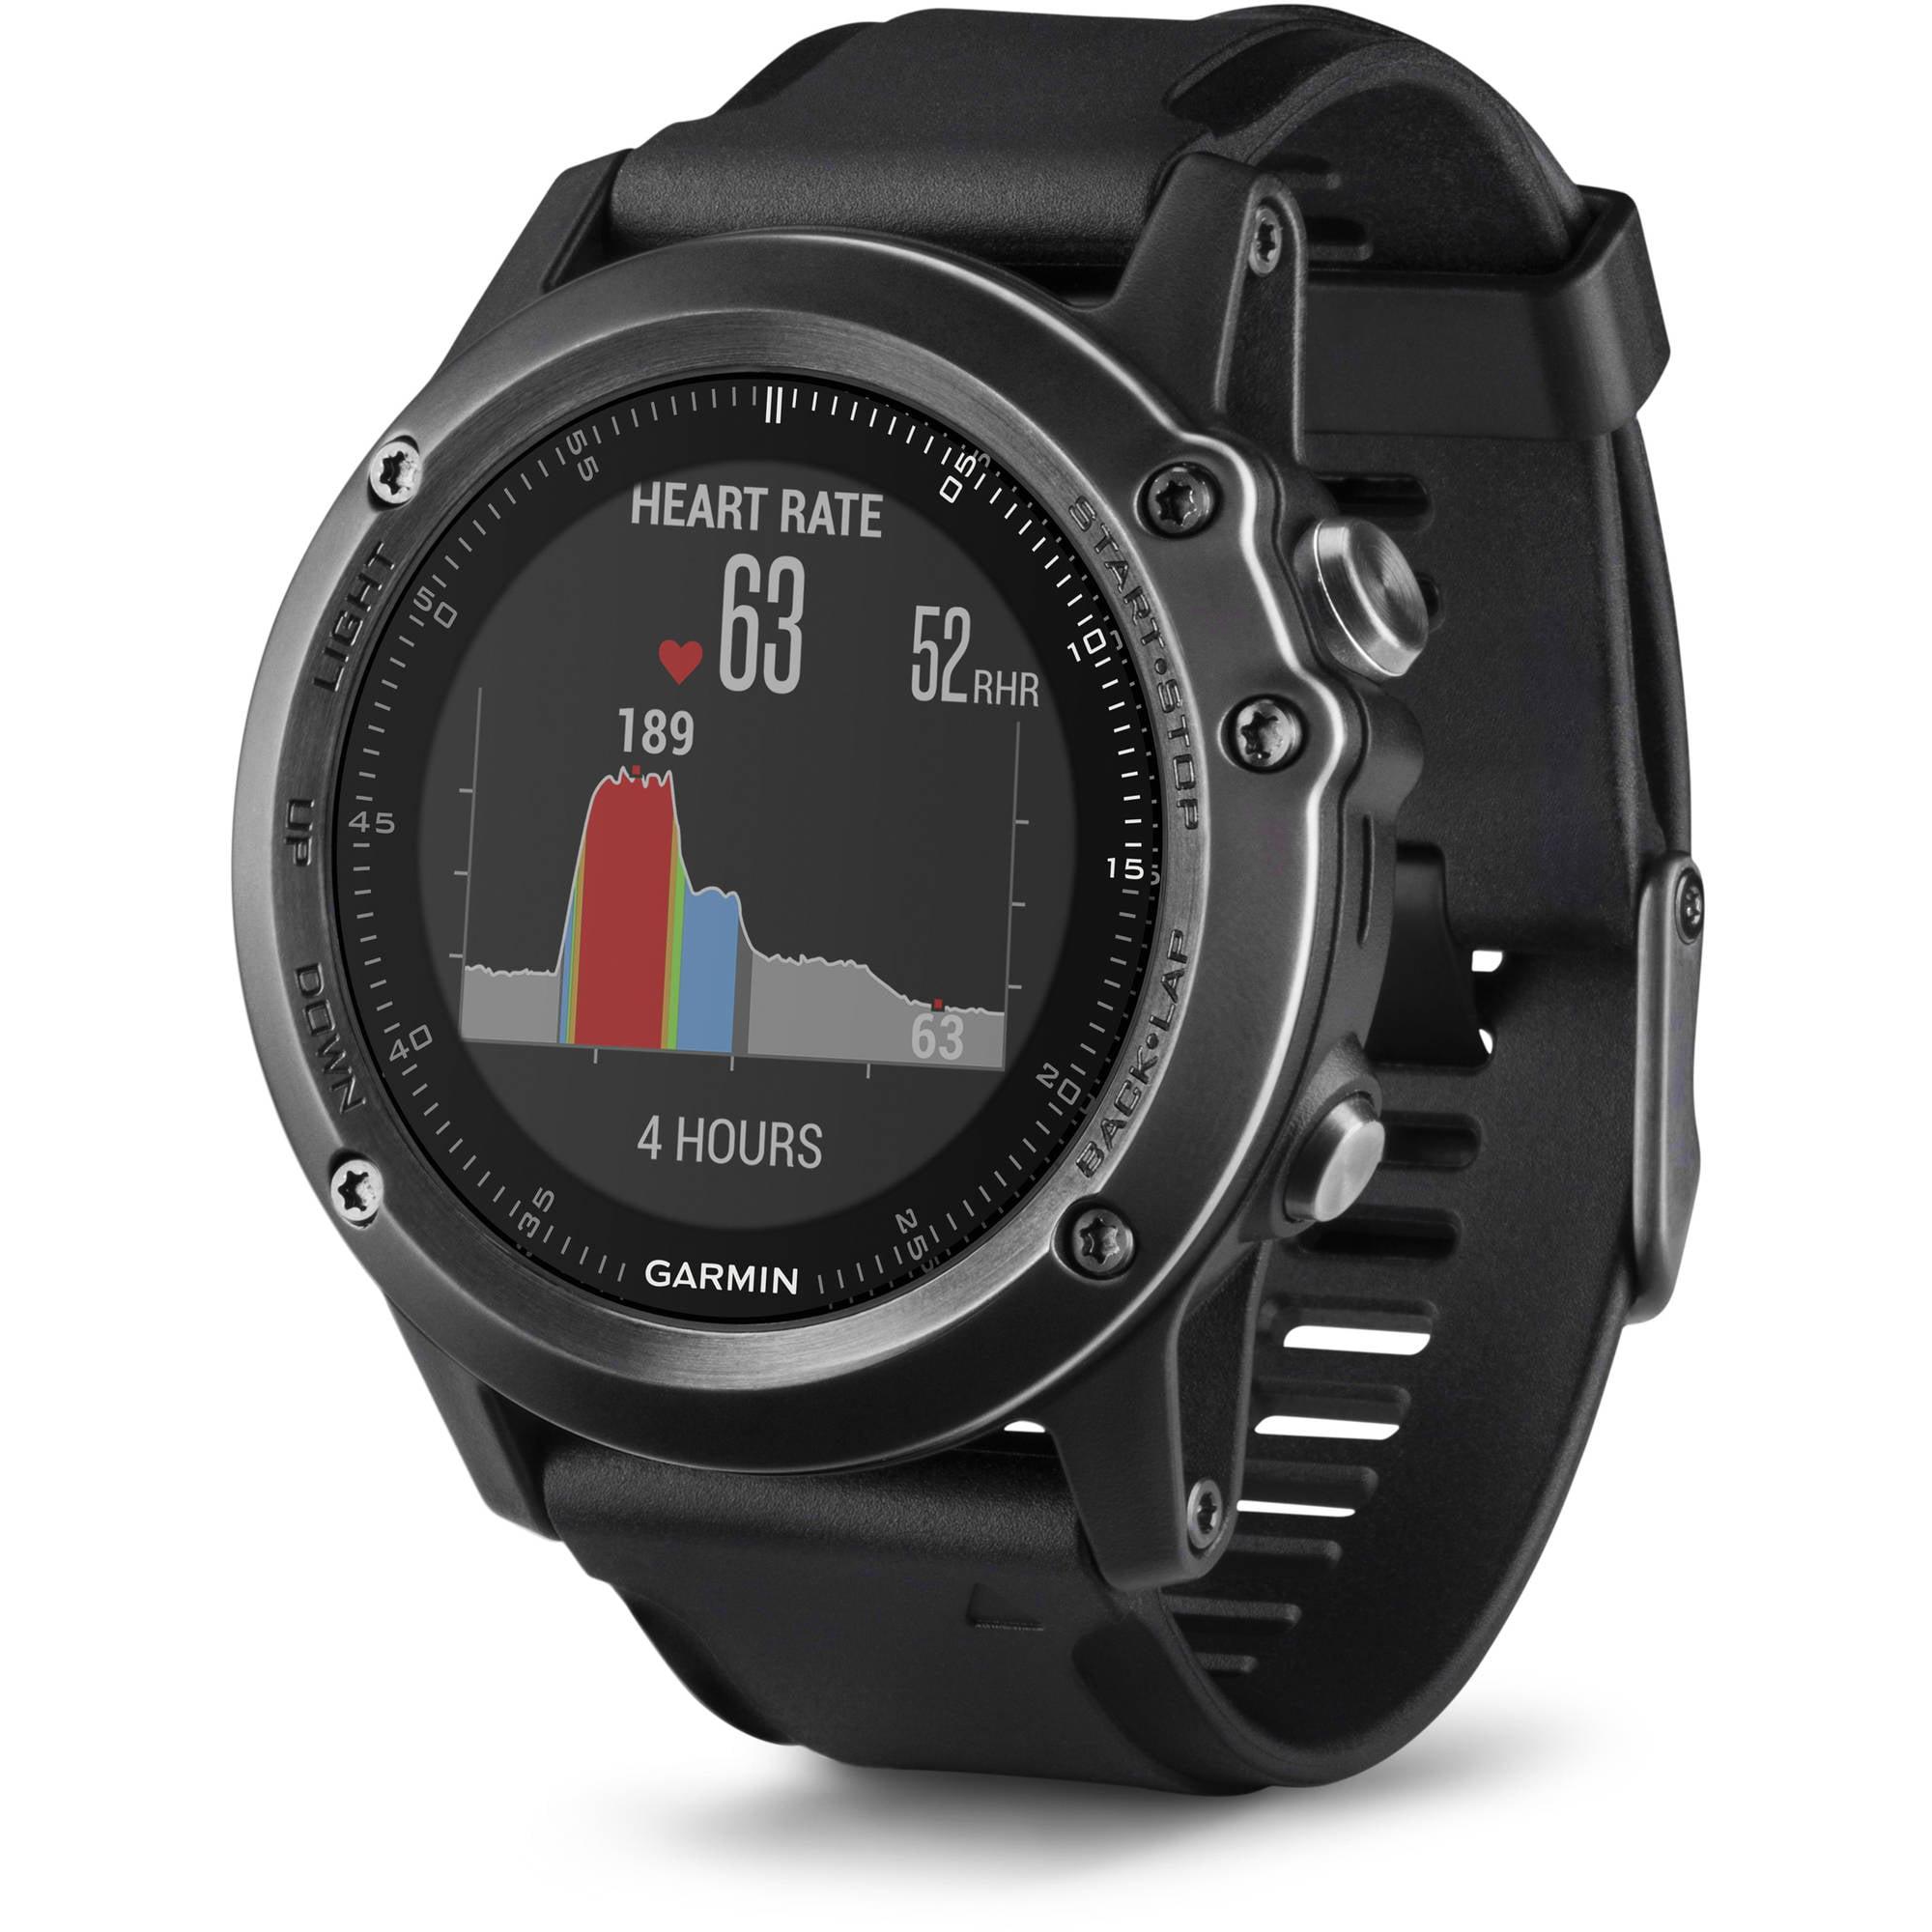 Garmin fenix 3 HR GPS Smartwatch by Garmin